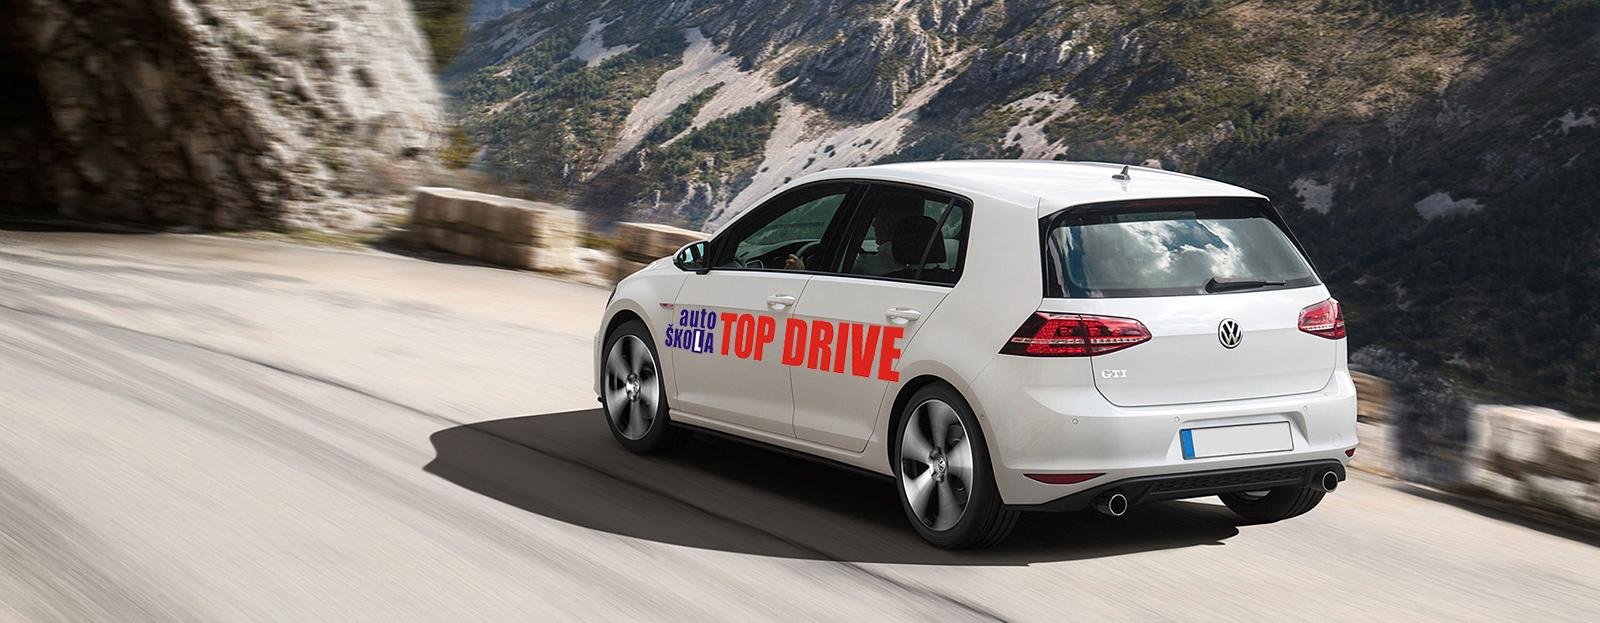 Auto skola top drive